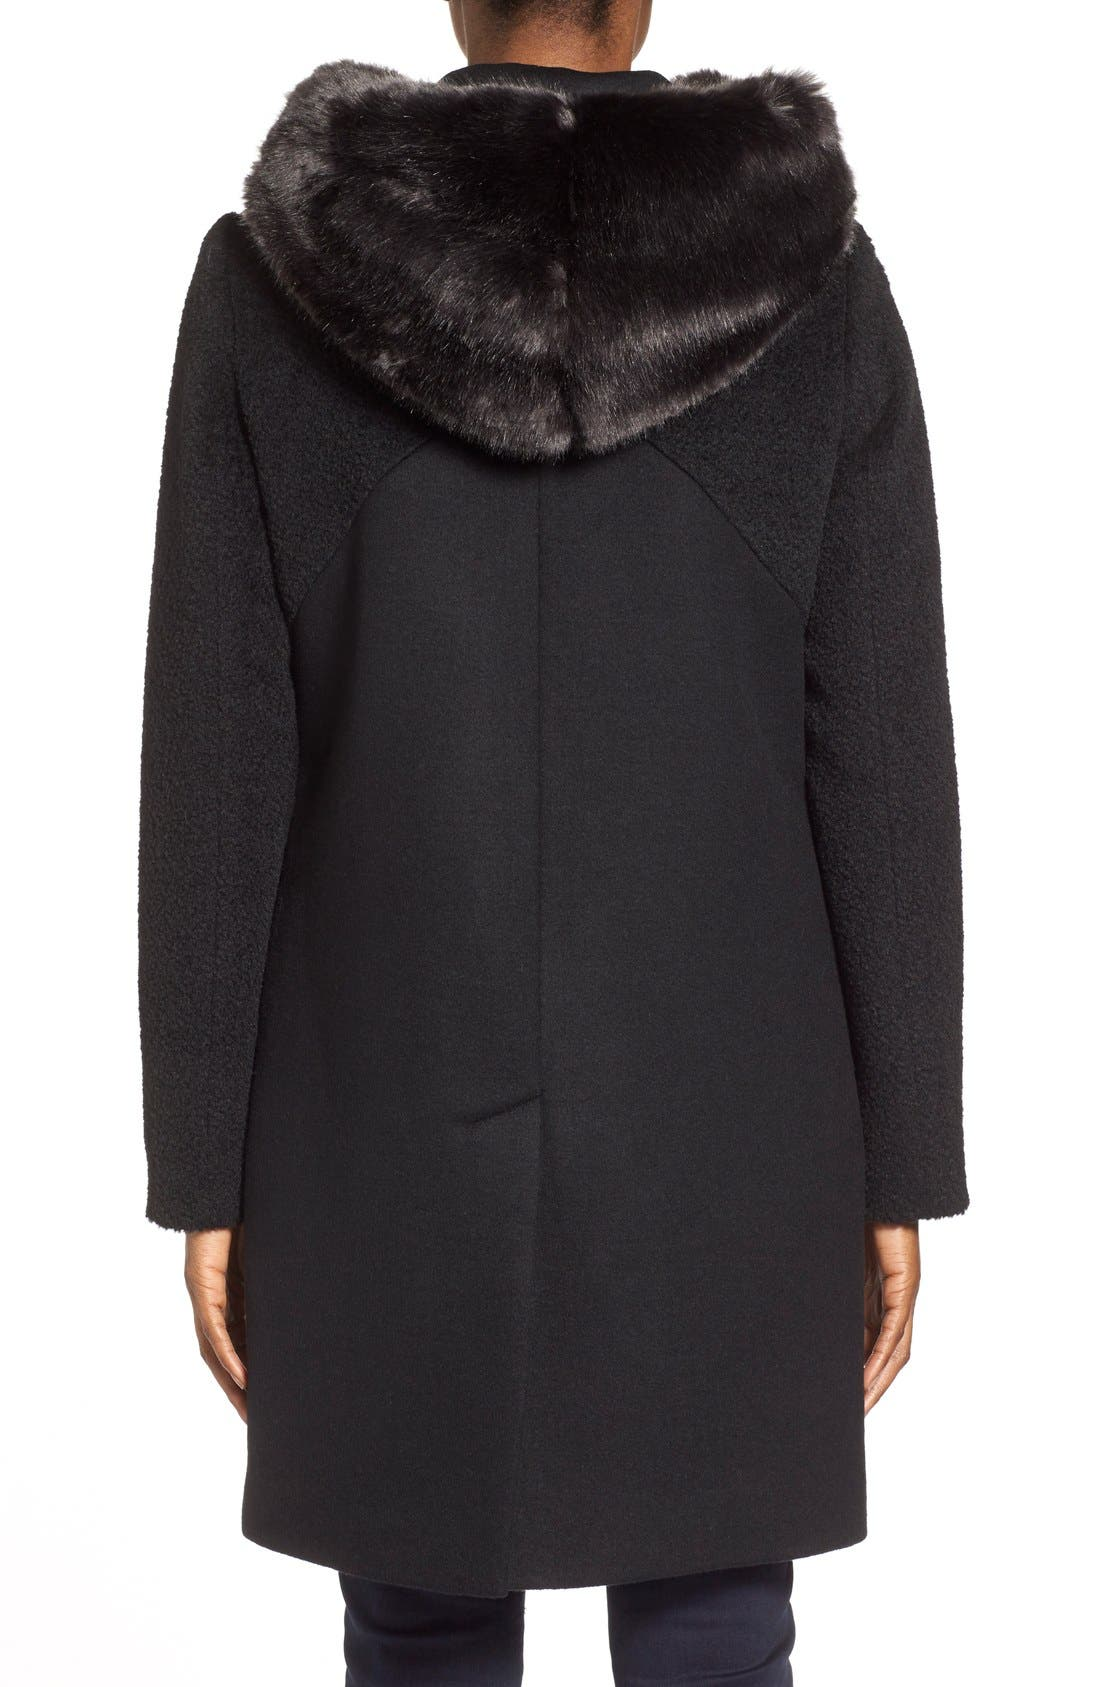 Alternate Image 2  - Dawn Levy 'Lara' Mixed Media Wool Blend Coat withFauxFur Hood